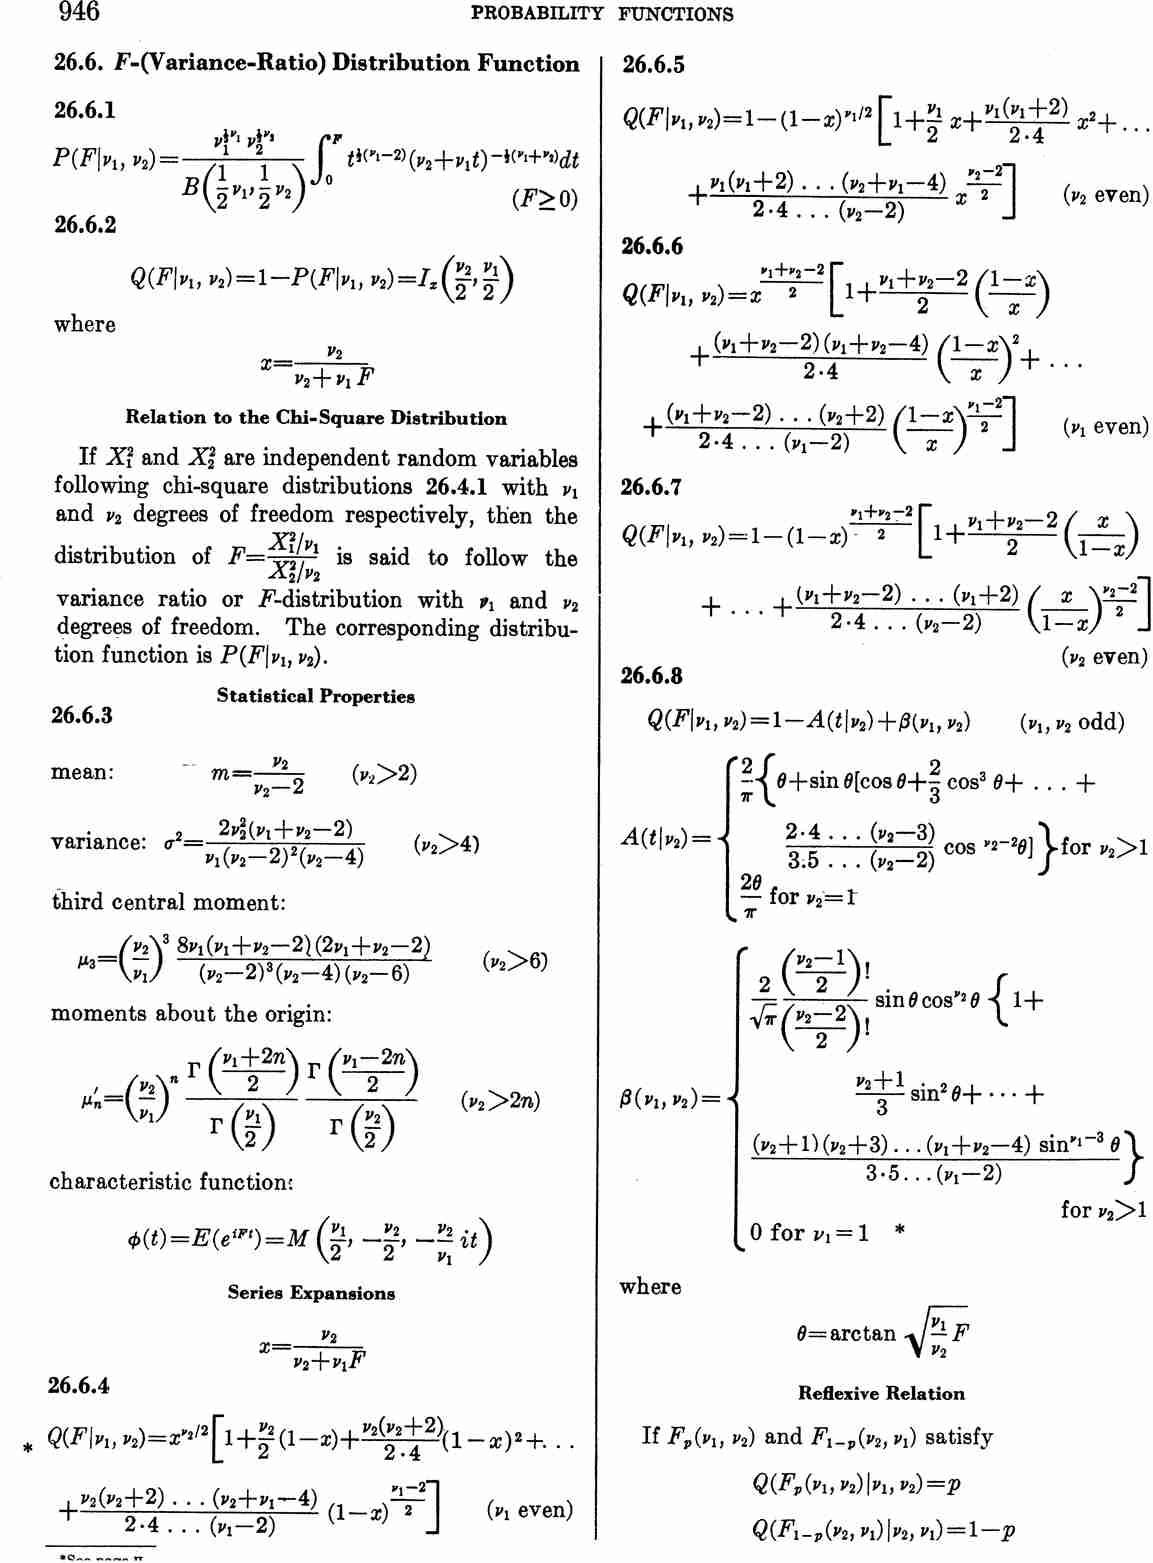 Abramowitz and Stegun. Page 946 Aands